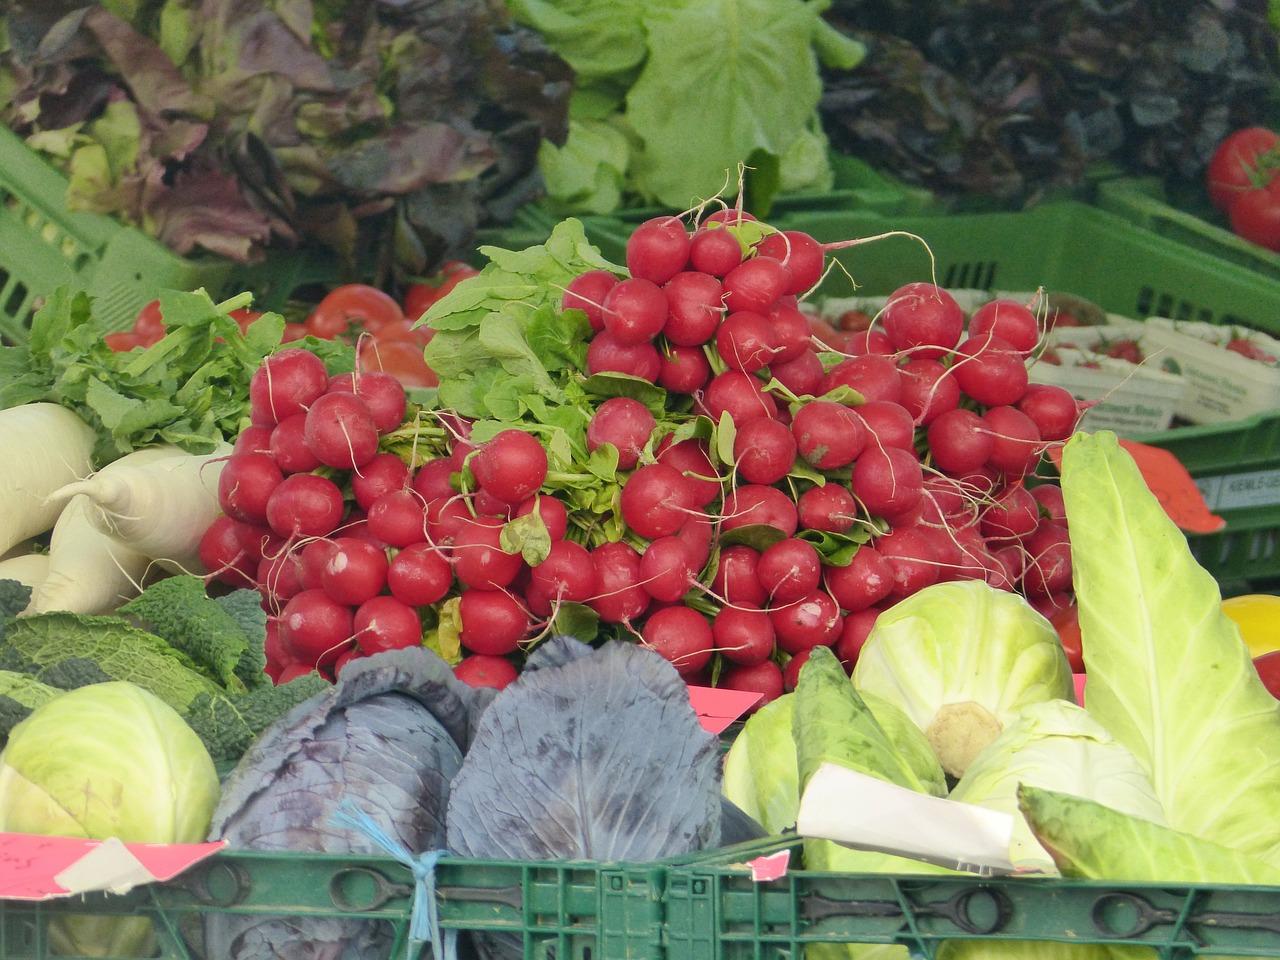 Gemüse Saat kaufen in Flensburg